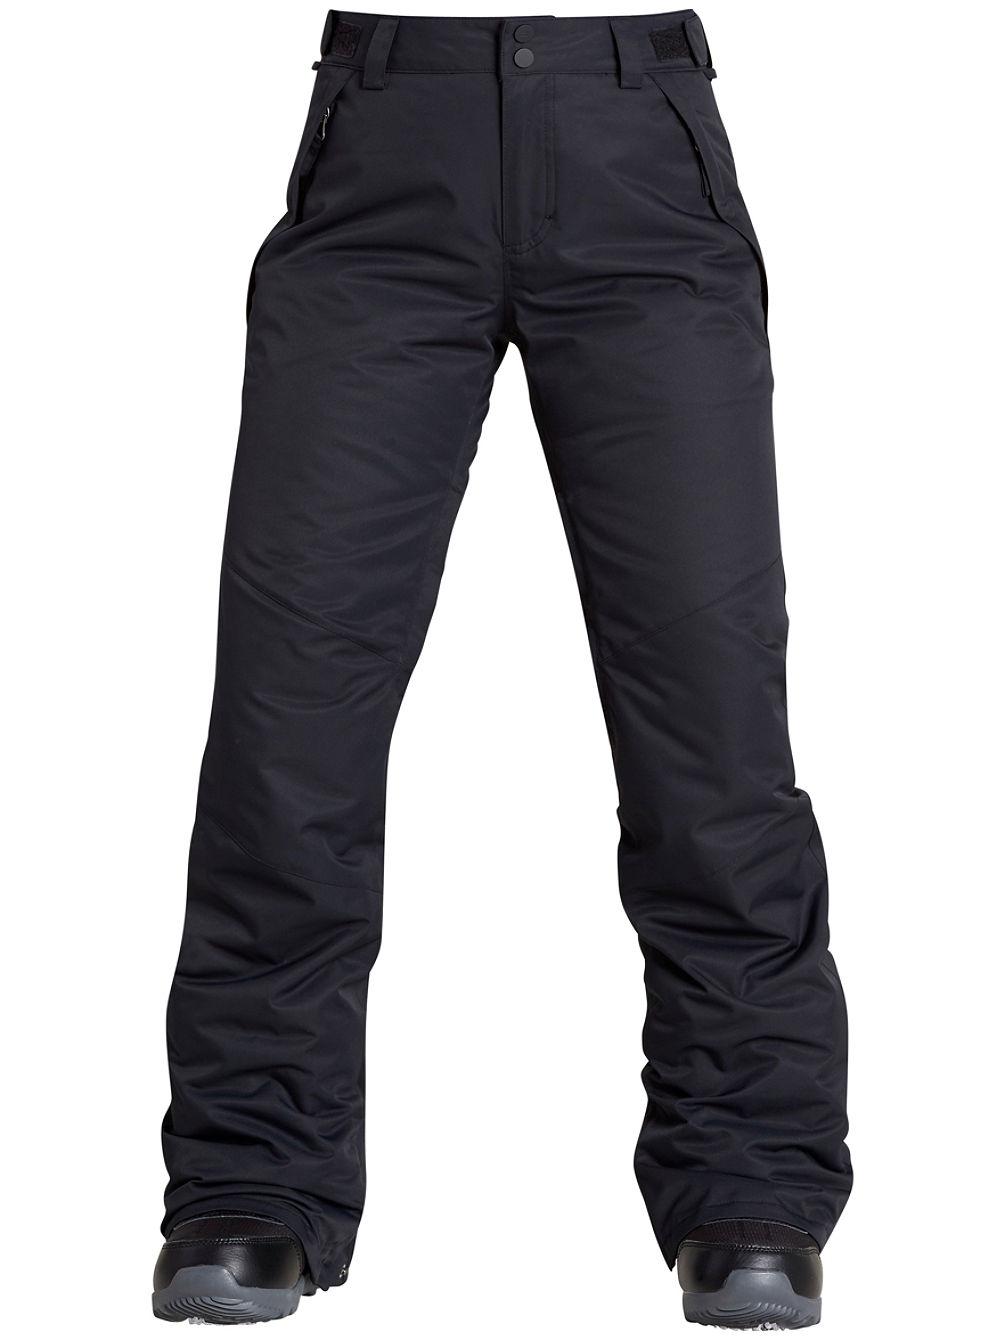 5c5d40318a Buy Billabong Malla Pants online at Blue Tomato